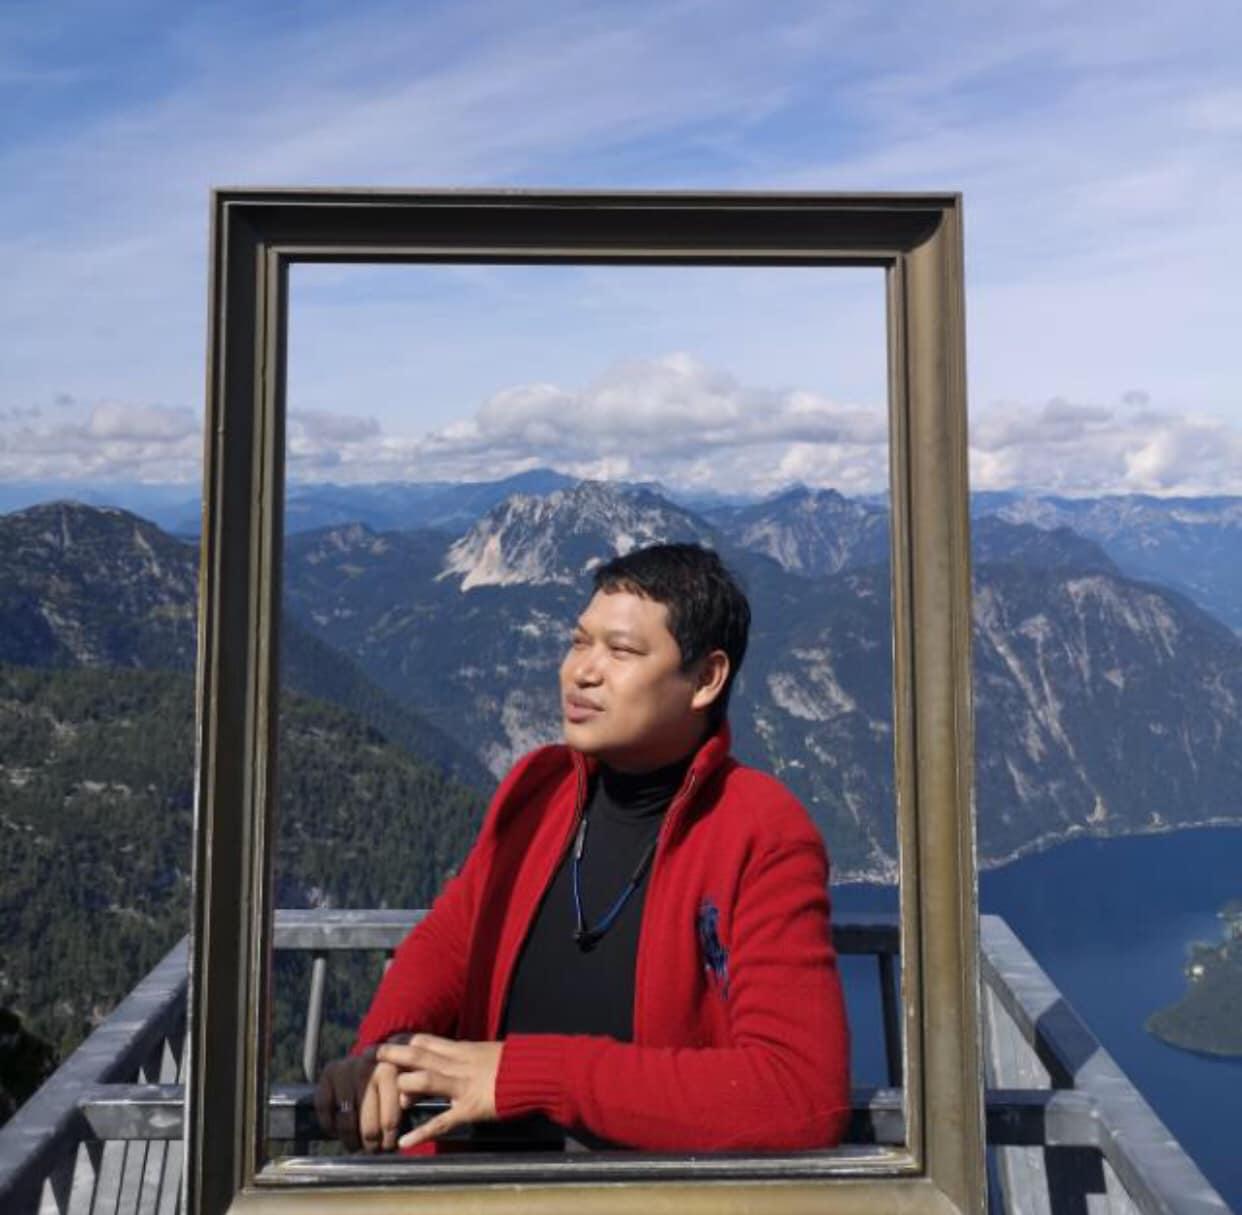 Norfadzi Abdullah takes a photo at a vantage point, during his travels.